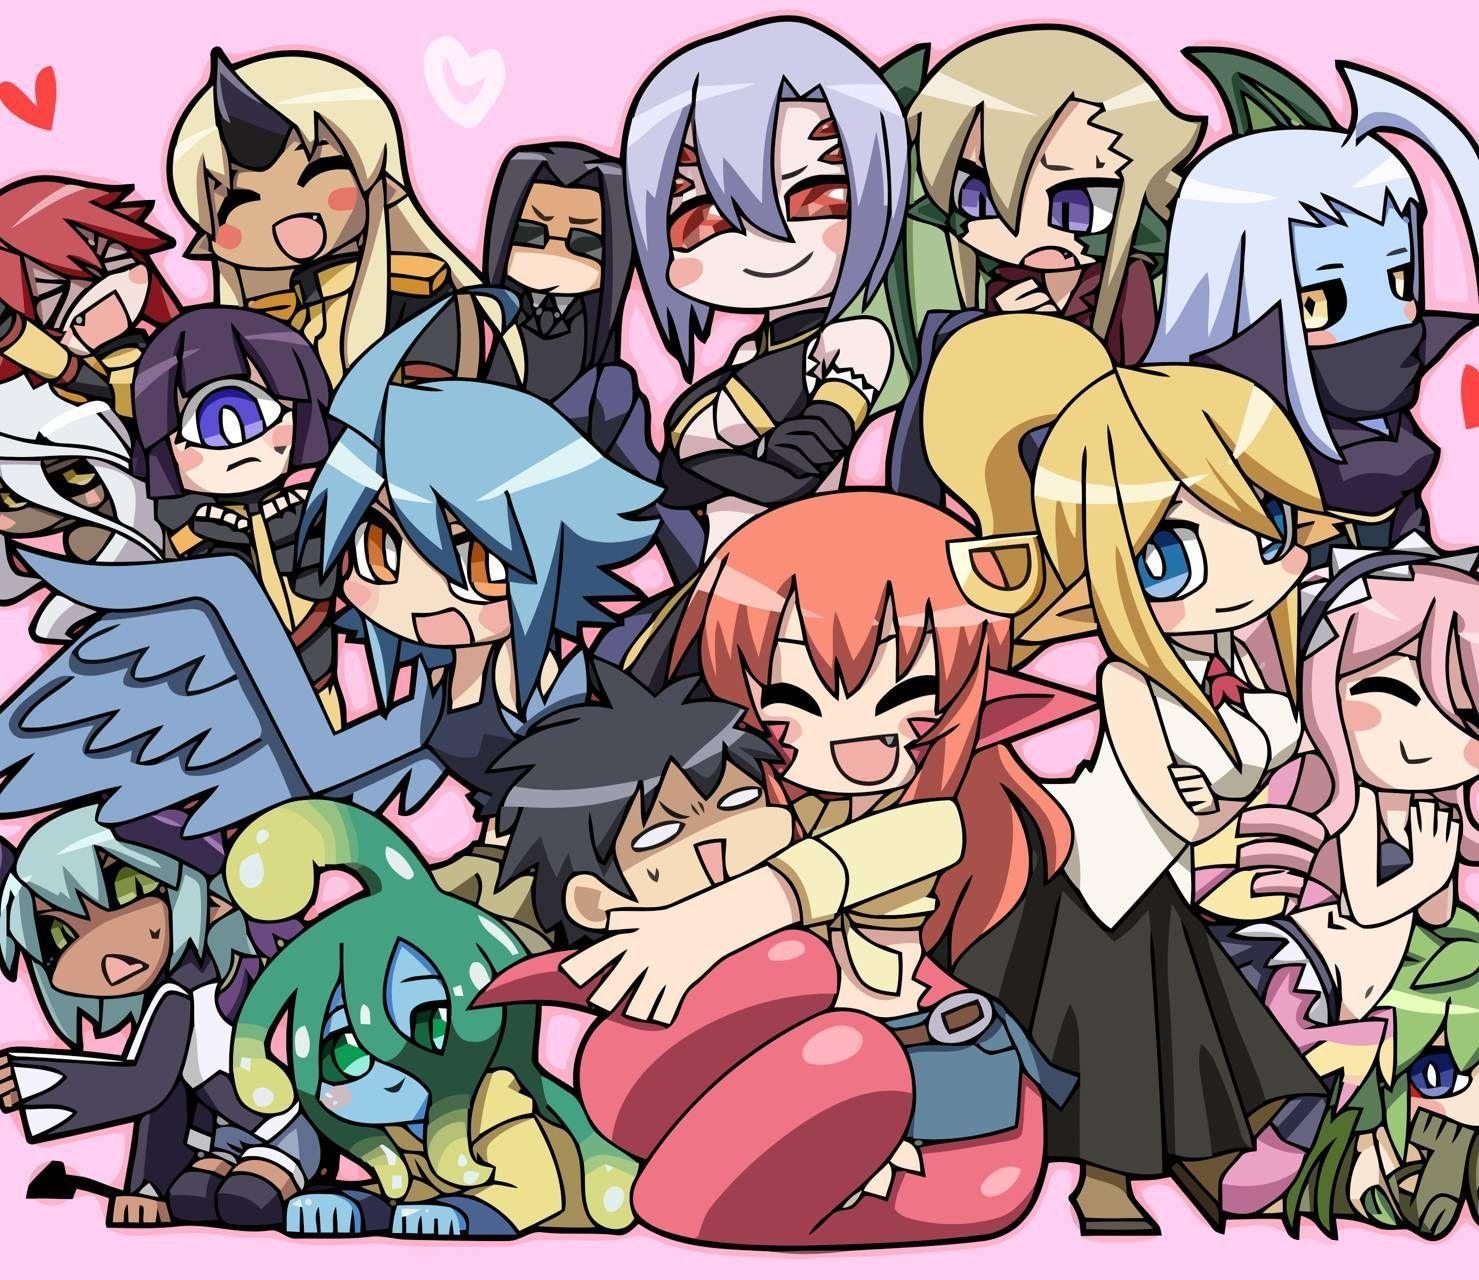 Monster Musume Wallpapers - Top Free Monster Musume ...